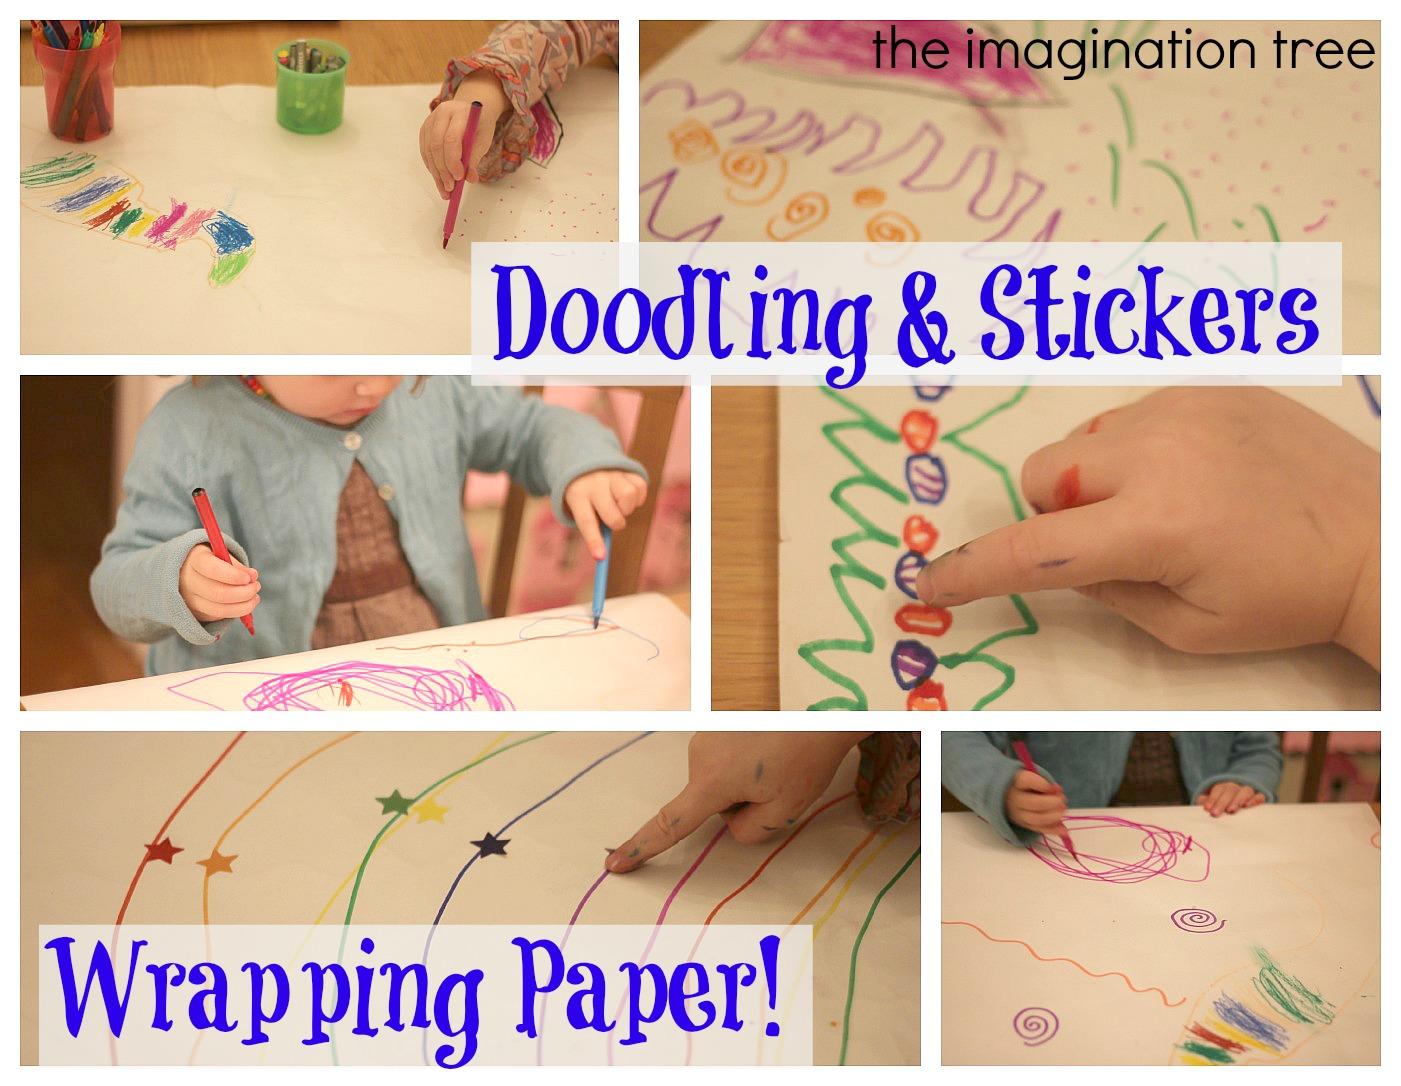 http://2.bp.blogspot.com/-bSfB4sCmOM0/ULv7kETCrSI/AAAAAAAALjk/FQXZ34iwM5I/s1600/Doodling+and+stickers+wrapping+paper.jpg